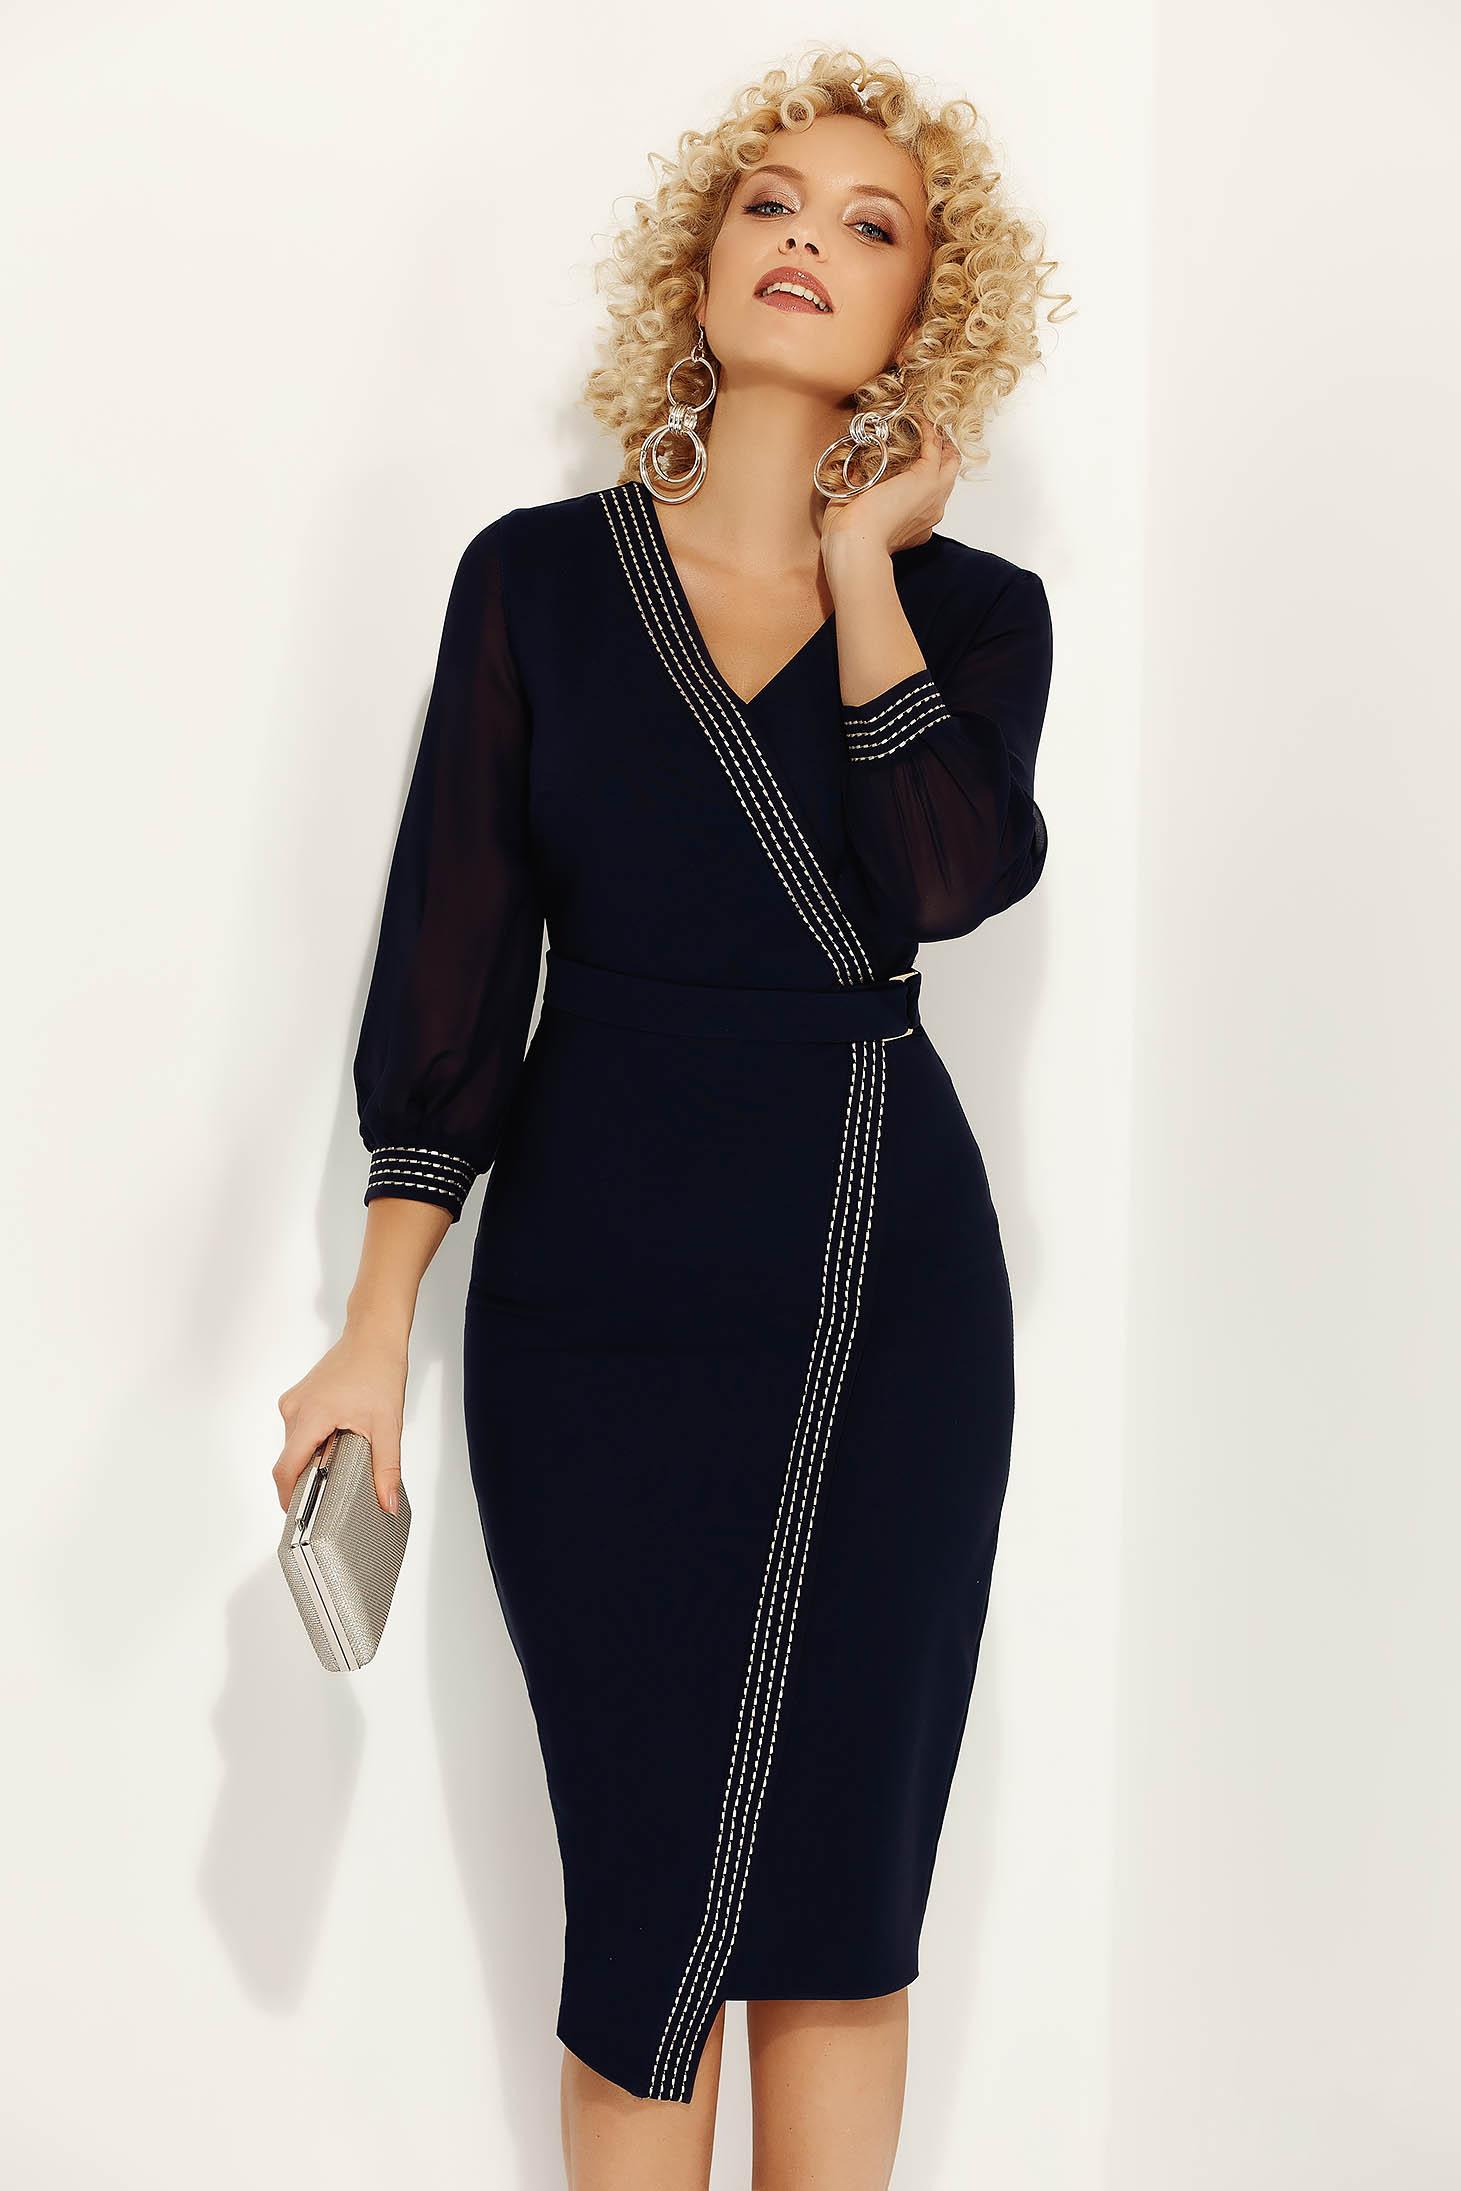 Rochie Fofy albastra-inchis eleganta office cu un croi mulat cu decolteu din stofa subtire usor elastica